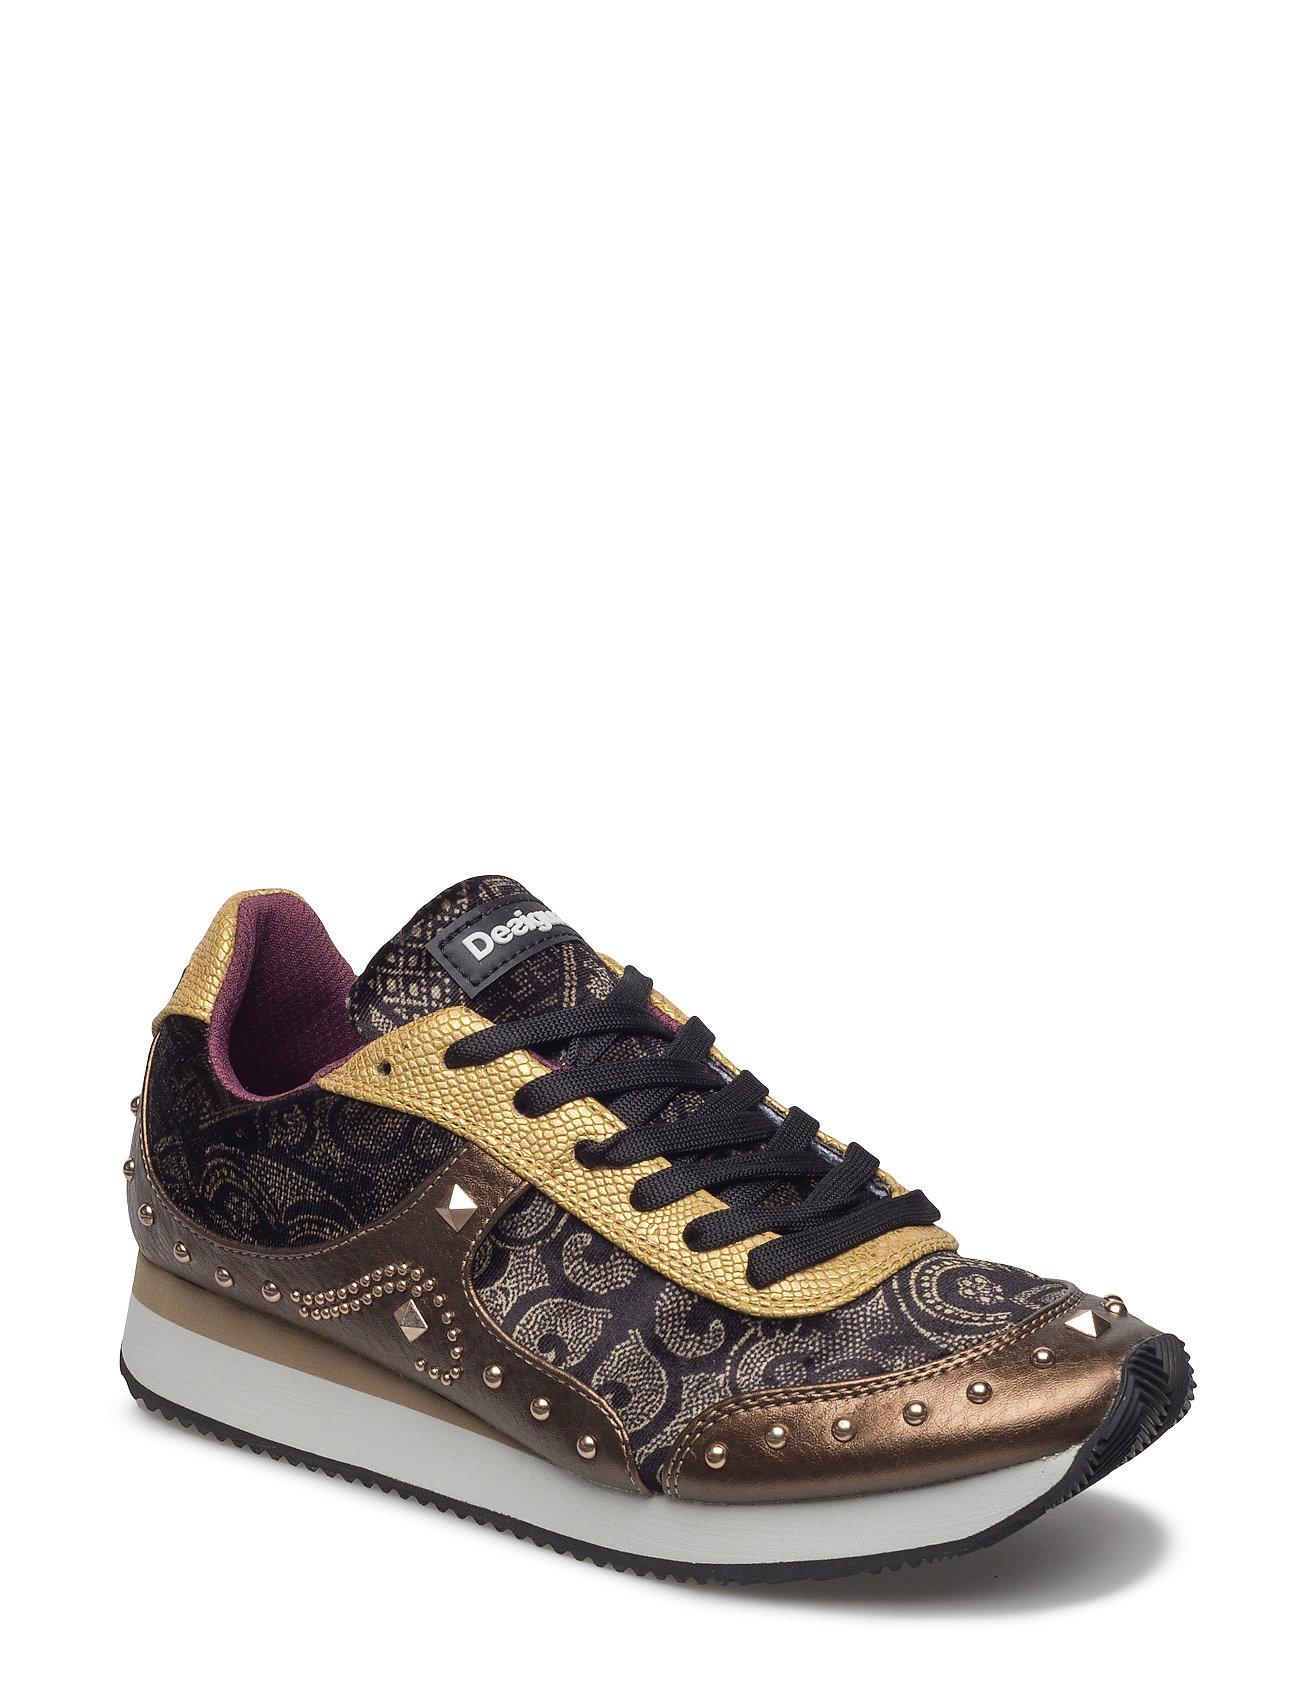 - Shoes Galaxy Blackstuds Desigual Shoes Shoes